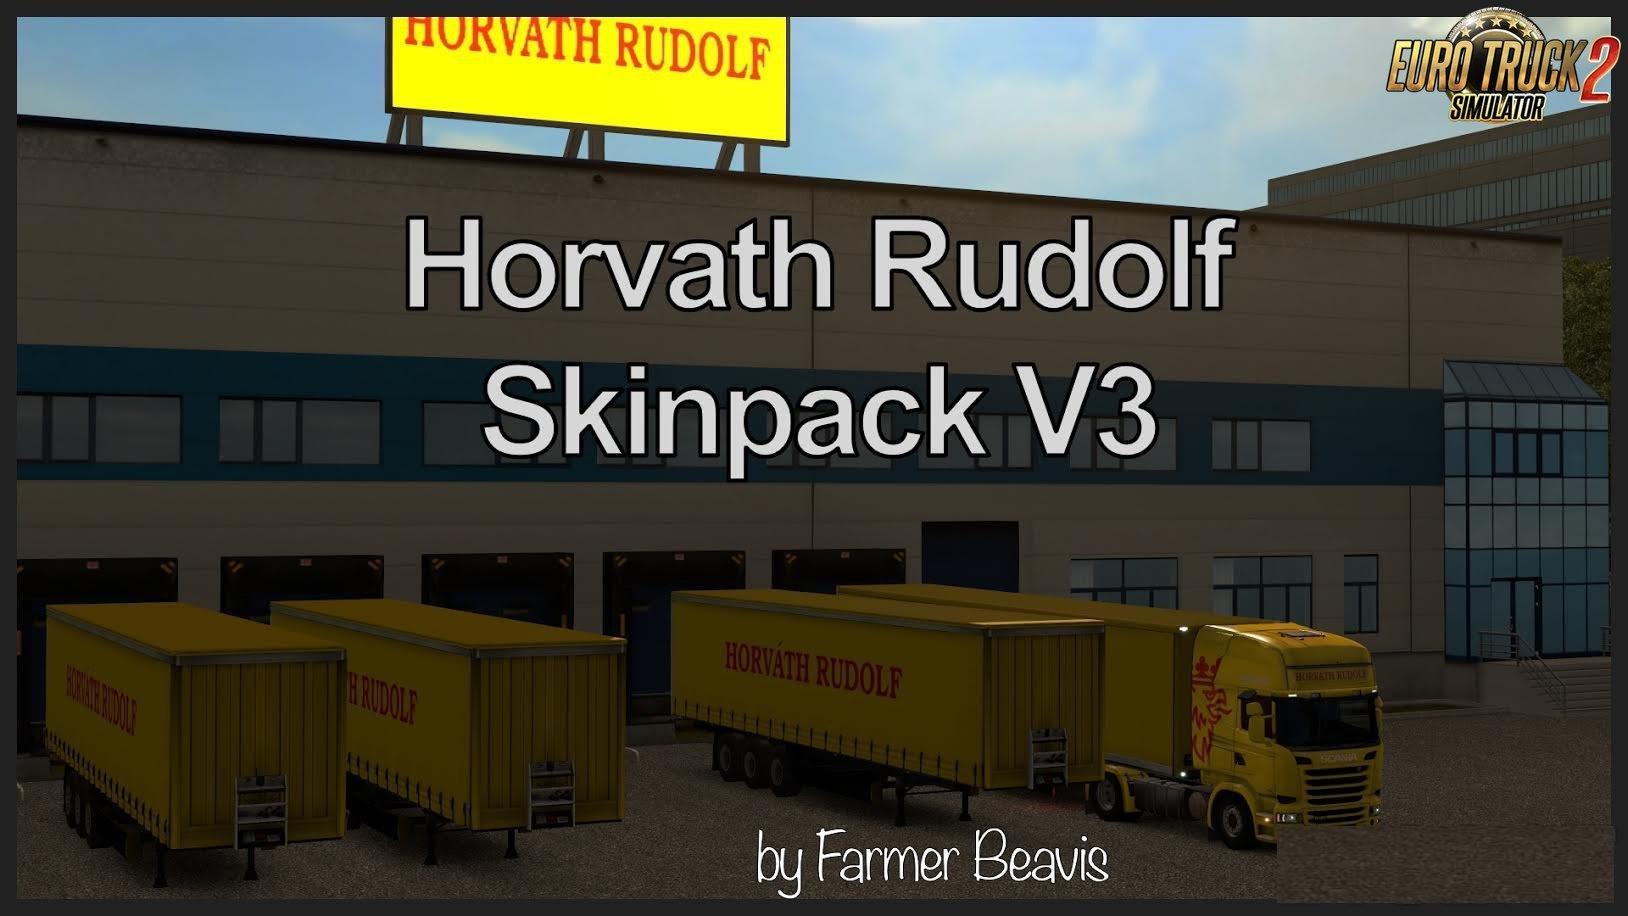 Horváth Rudolf Skinpack v3